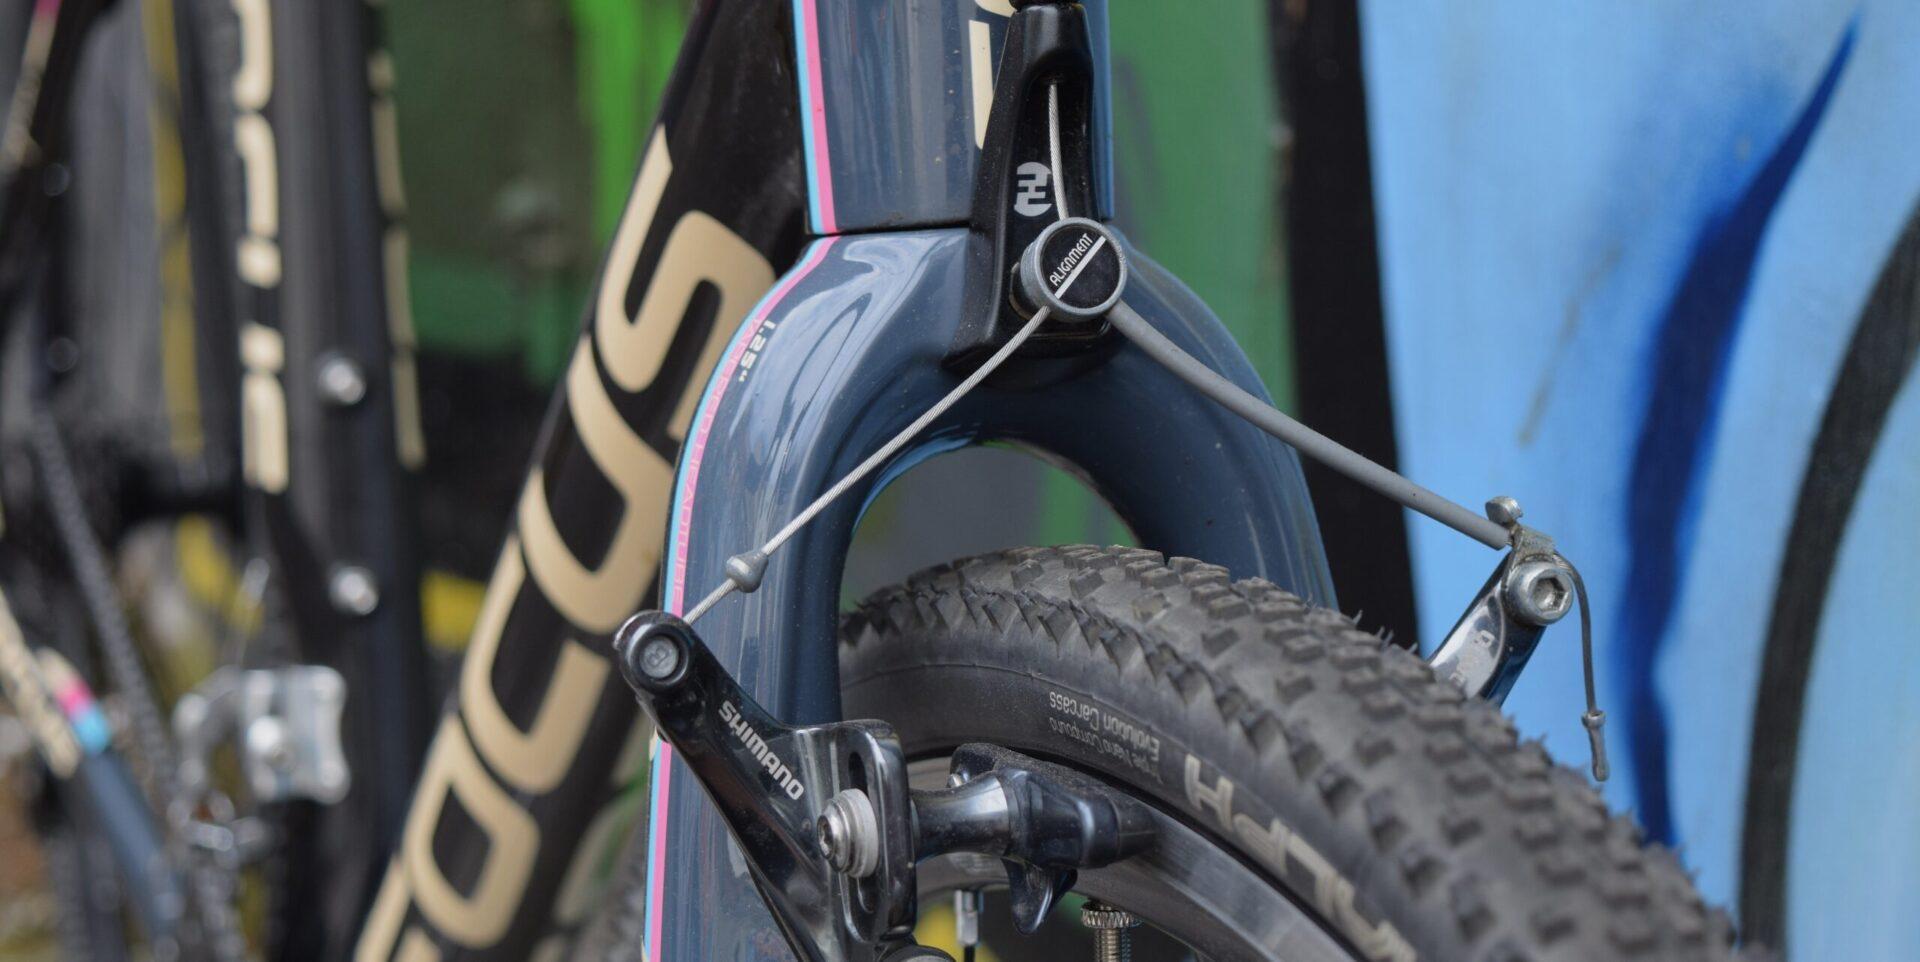 Broad Street Cycles Bike Shop – Broad Street Cycles